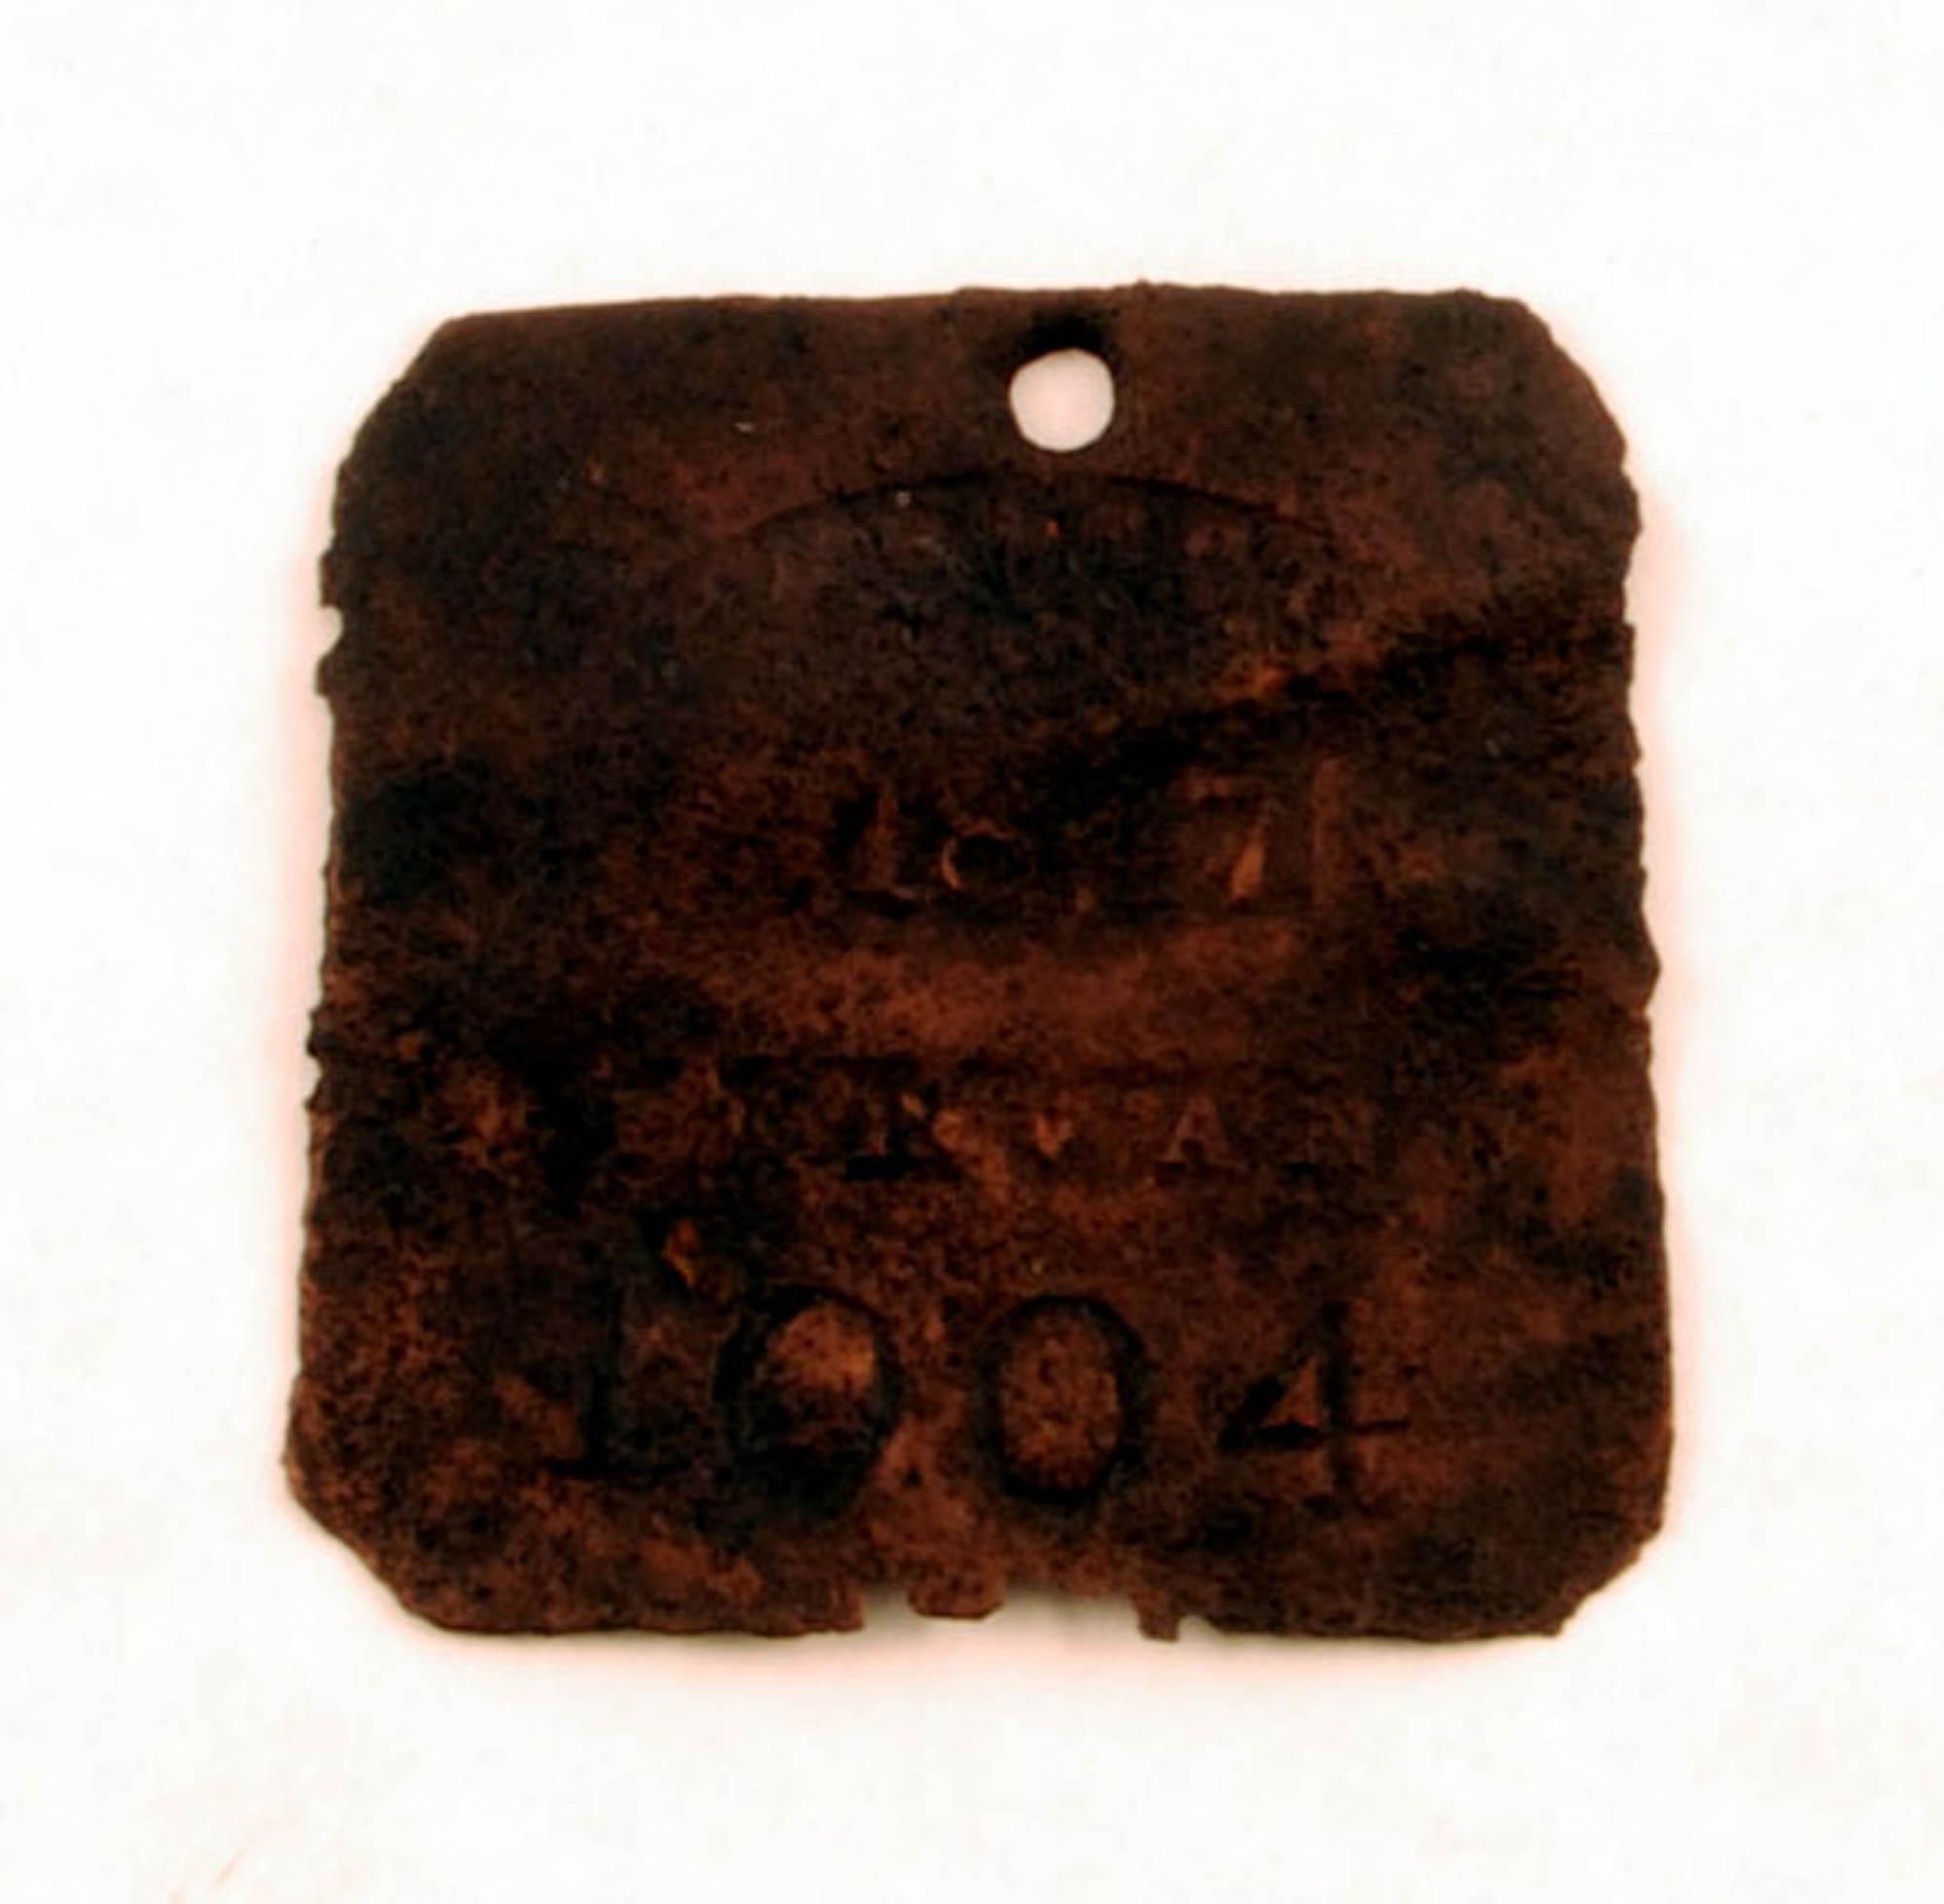 Slave badge